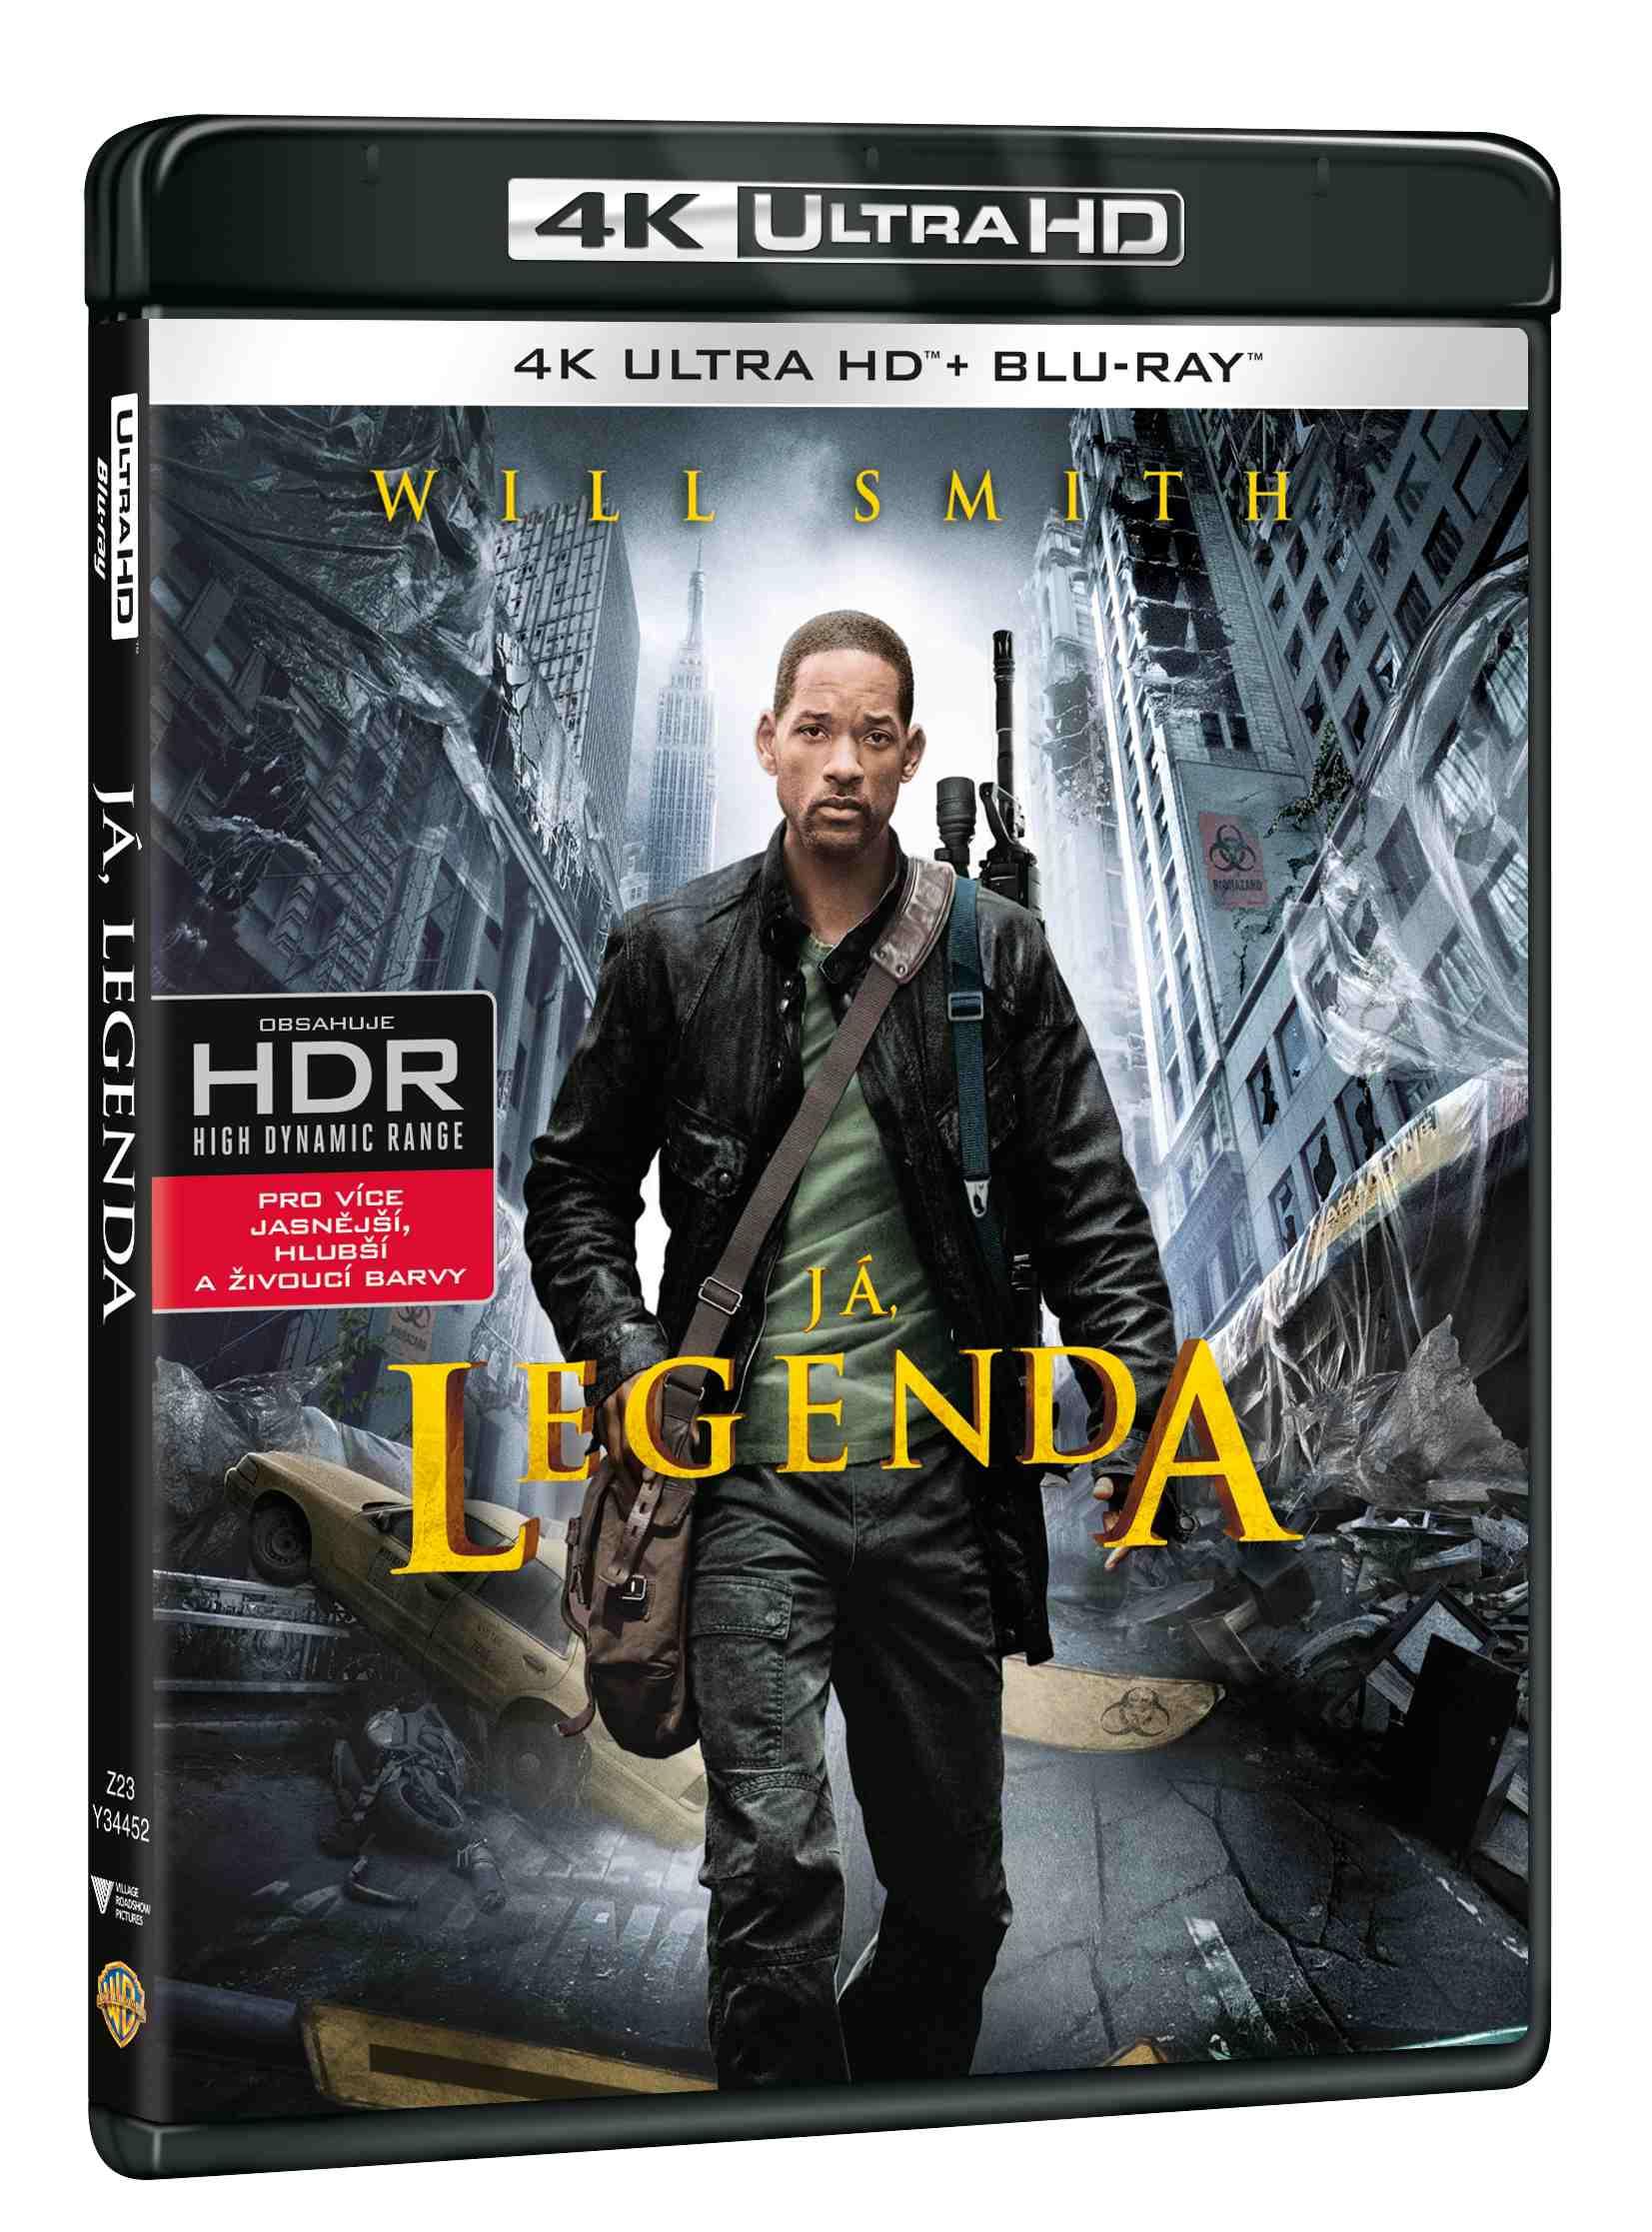 JÁ, LEGENDA (4K ULTRA HD) - UHD Blu-ray + Blu-ray (2 BD)